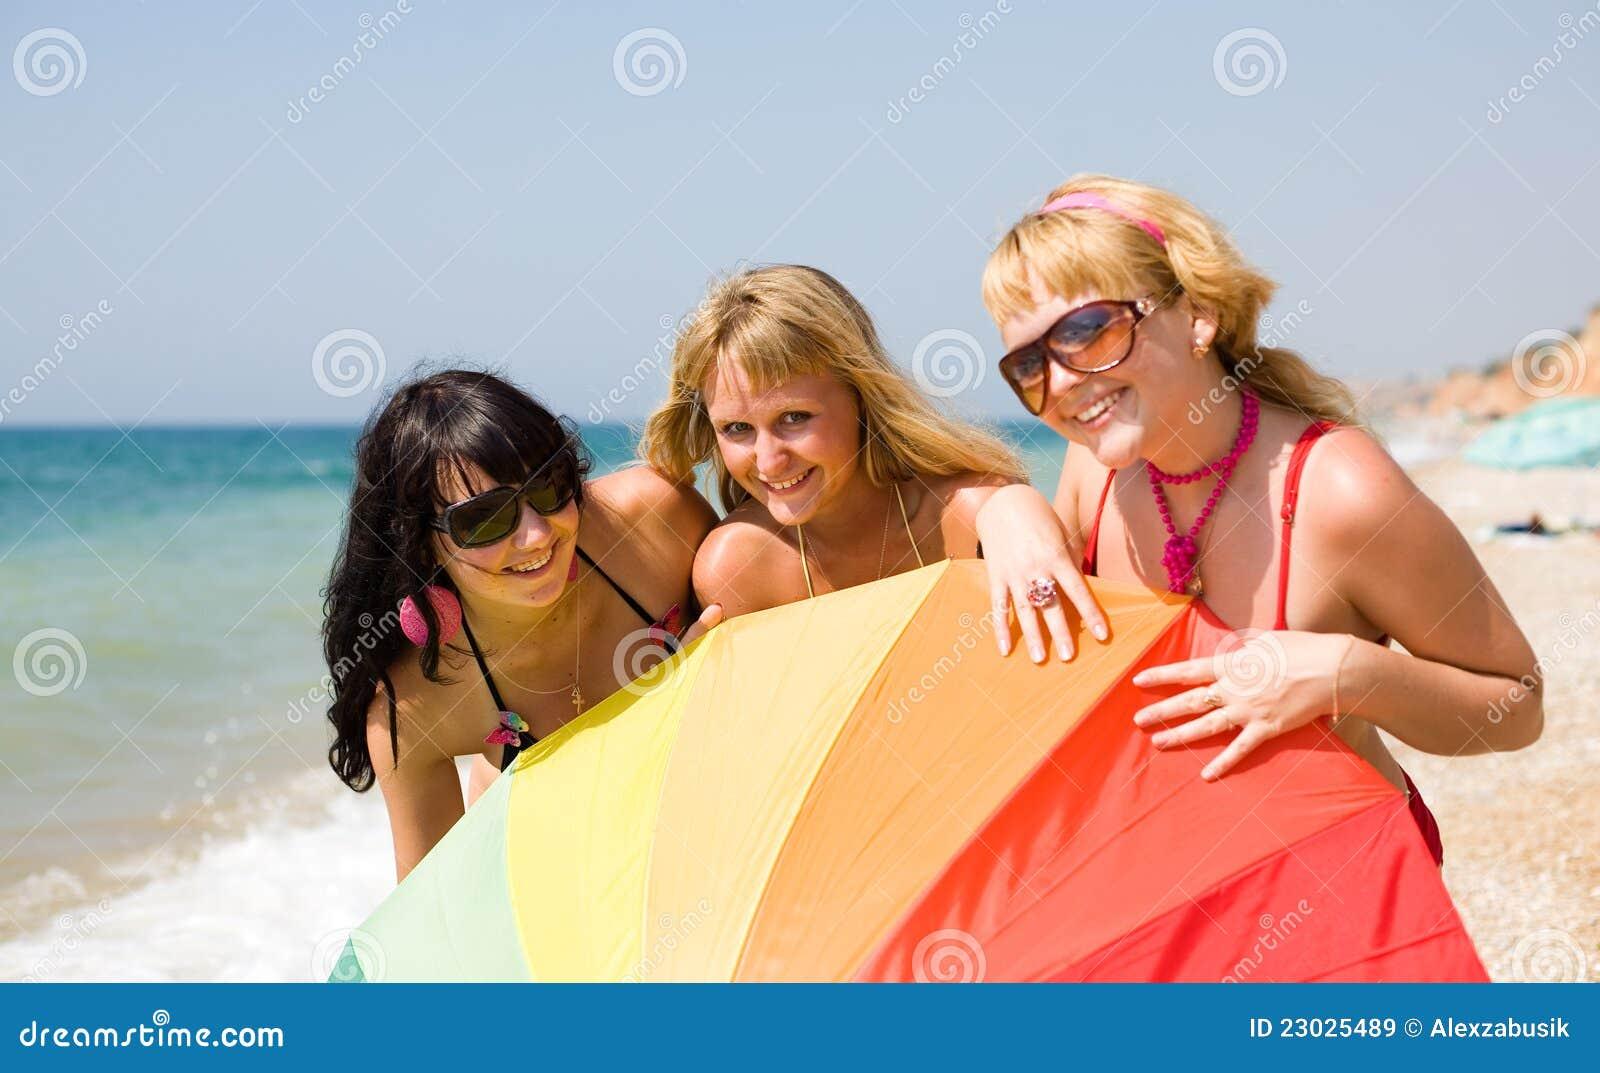 filles sur la plage image stock image du nature photo 23025489. Black Bedroom Furniture Sets. Home Design Ideas